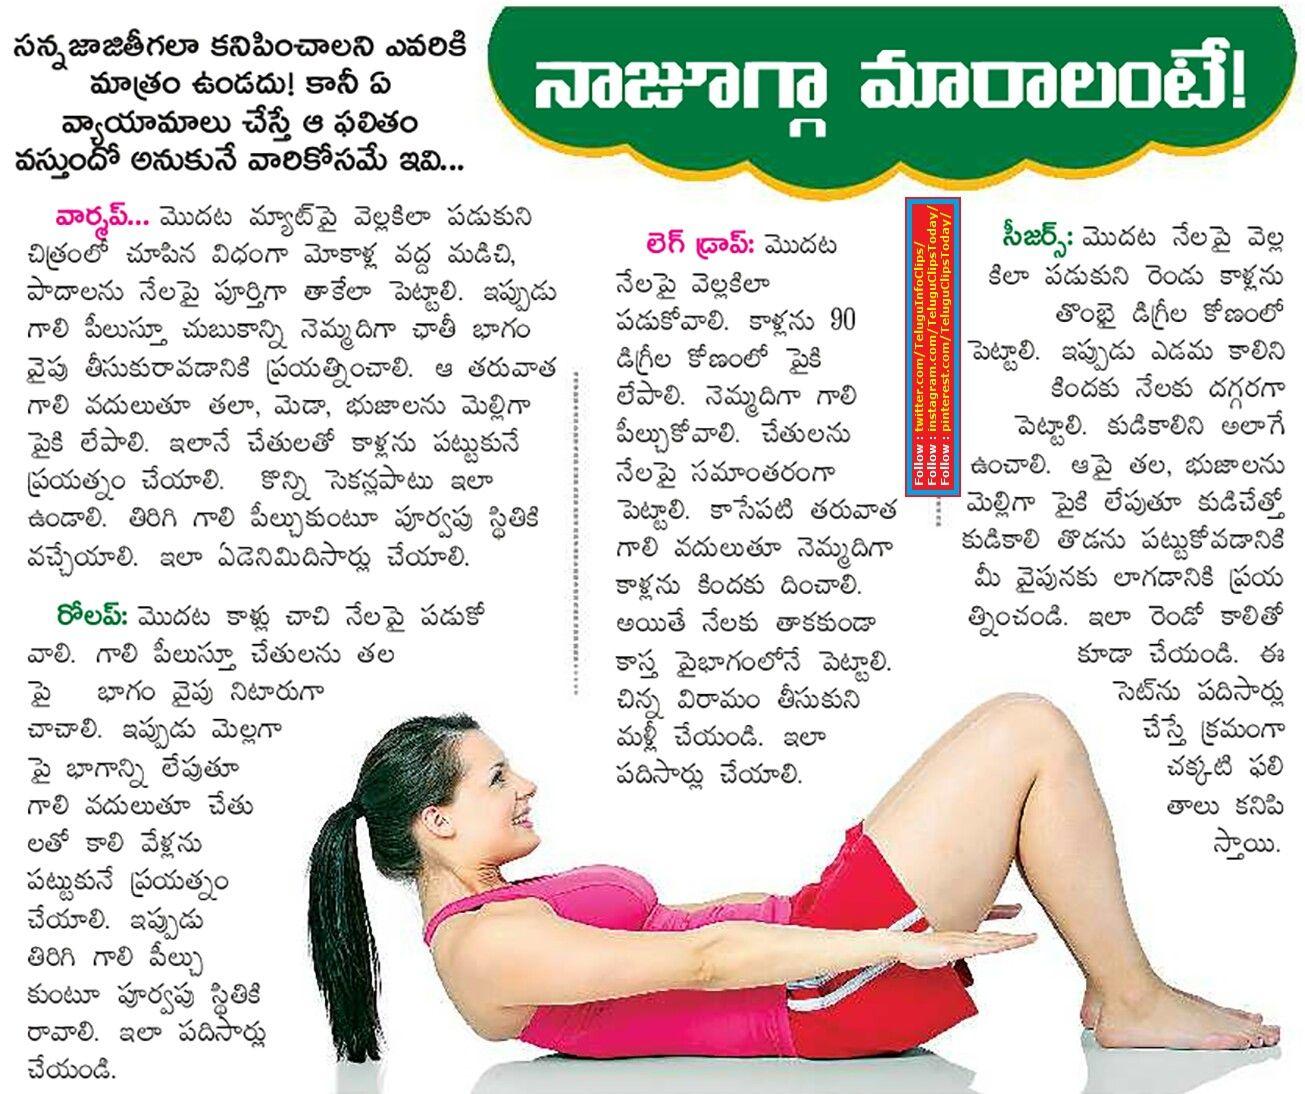 Yoga Exercises To Slim Info In Telugu In 2020 Yoga Fitness Exercise Ads